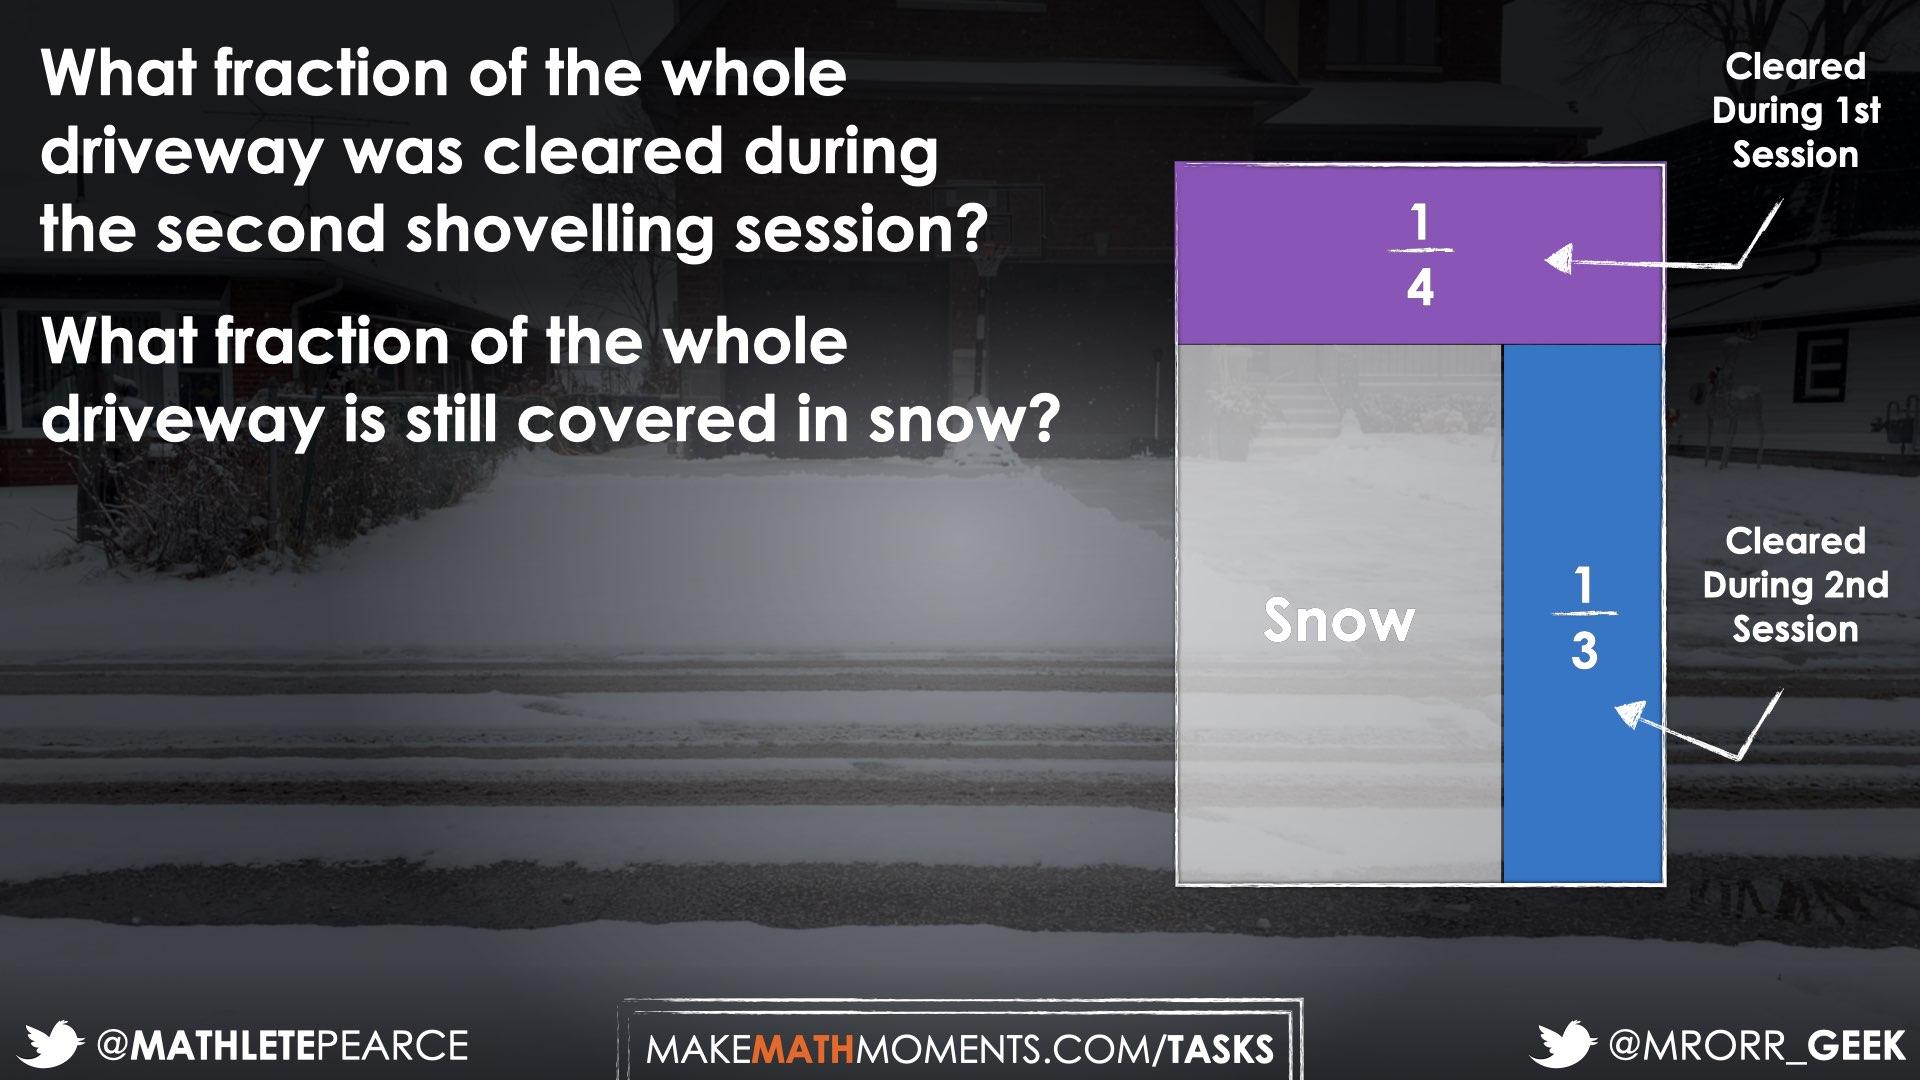 Shovelling-The-Driveway-Day-1-07-Sense-Making-Productive-Struggle-and-Update-Estimate-image.jpeg